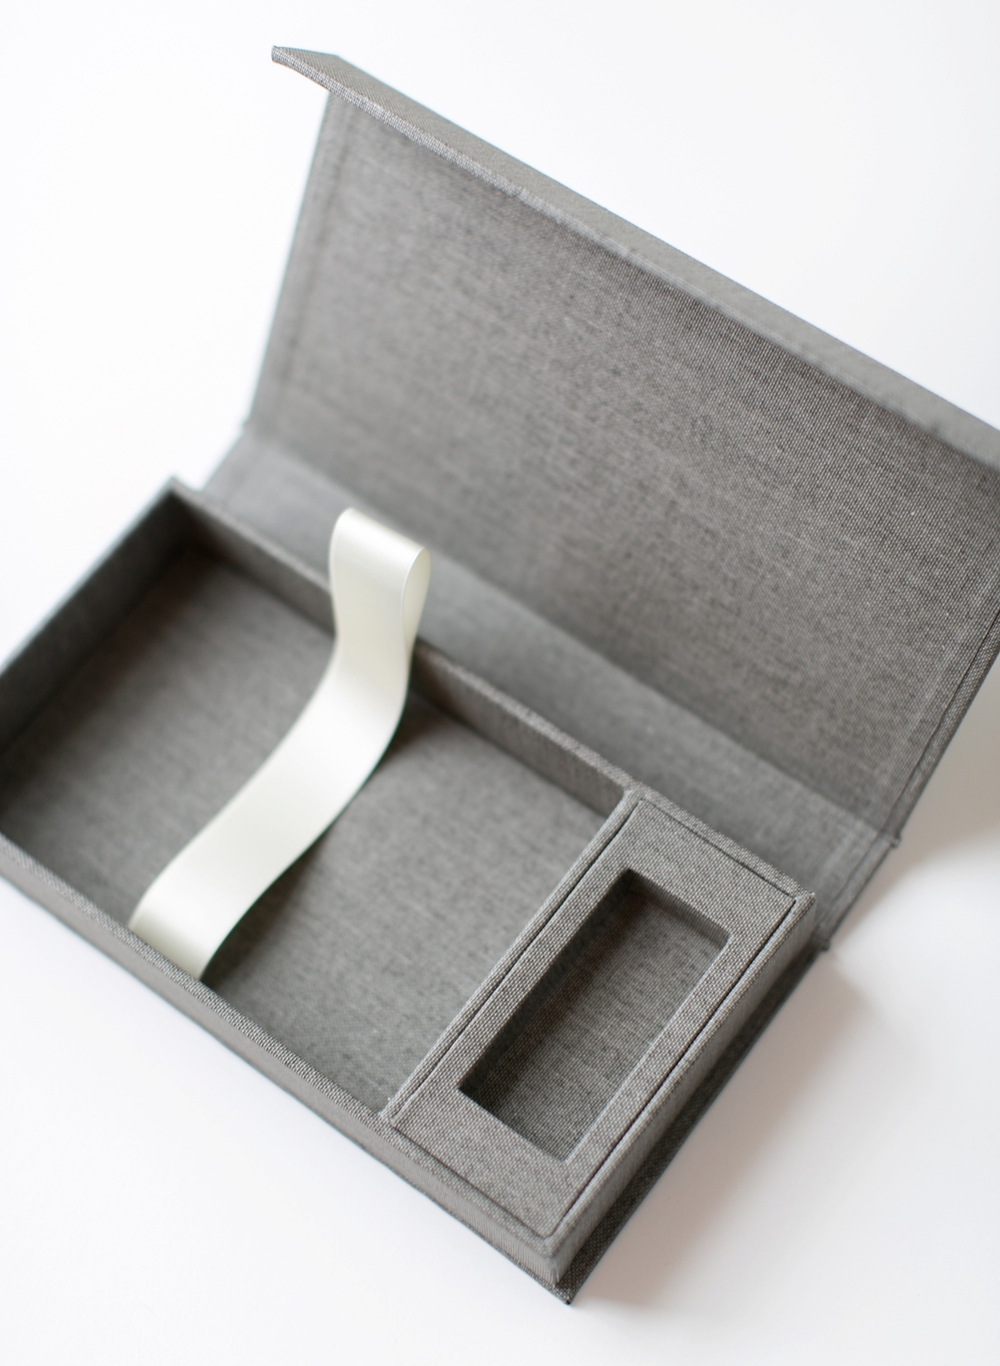 7-4x6-USB-graybuckram_02.JPG